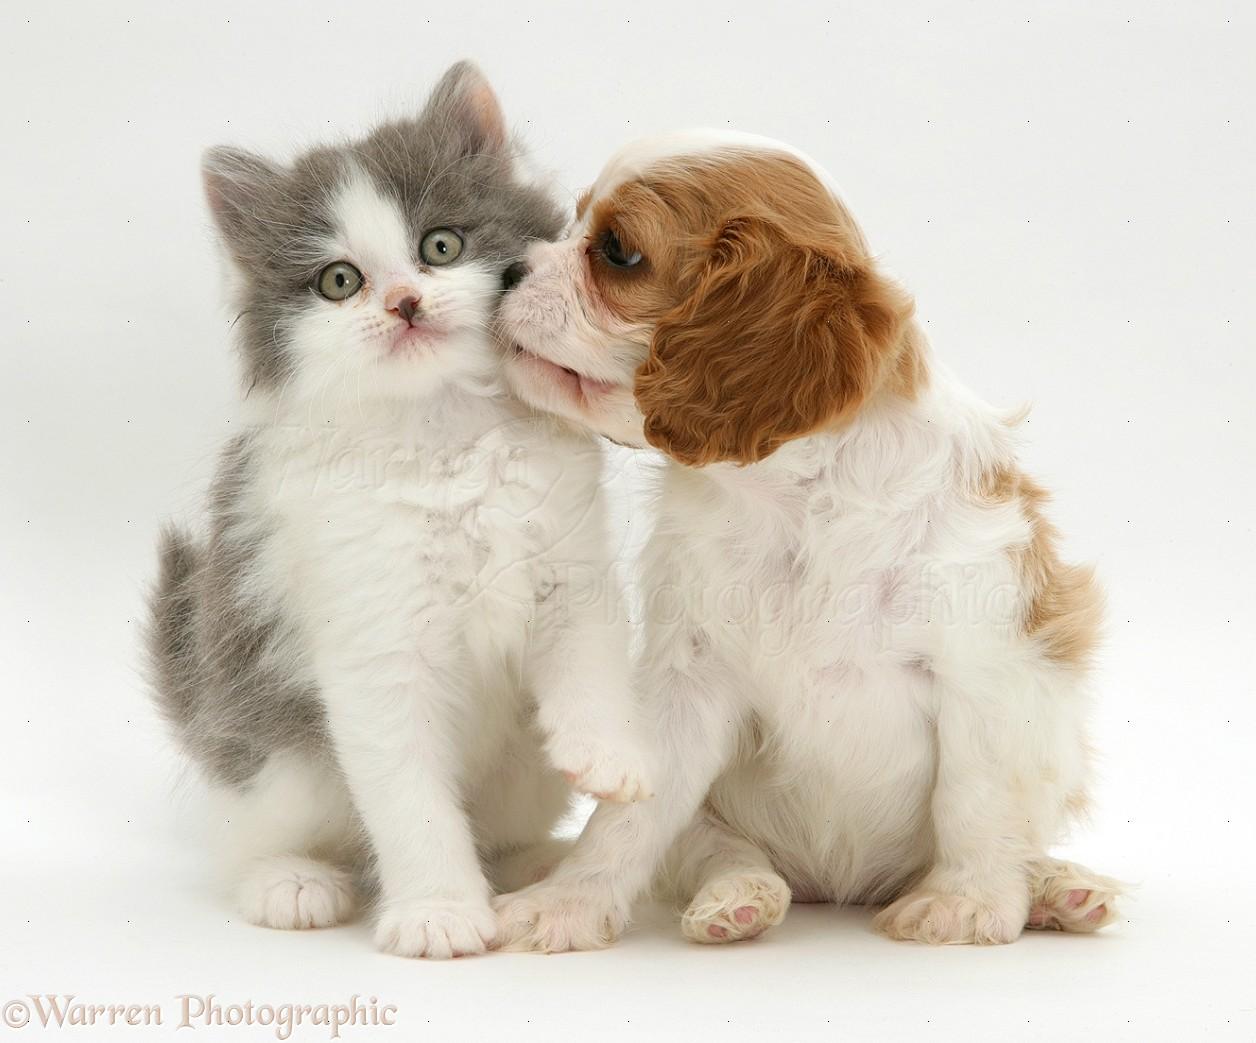 Cute Alpine Spaniel Puppies: Cute Cute Puppies And Kittens Kissing Breed